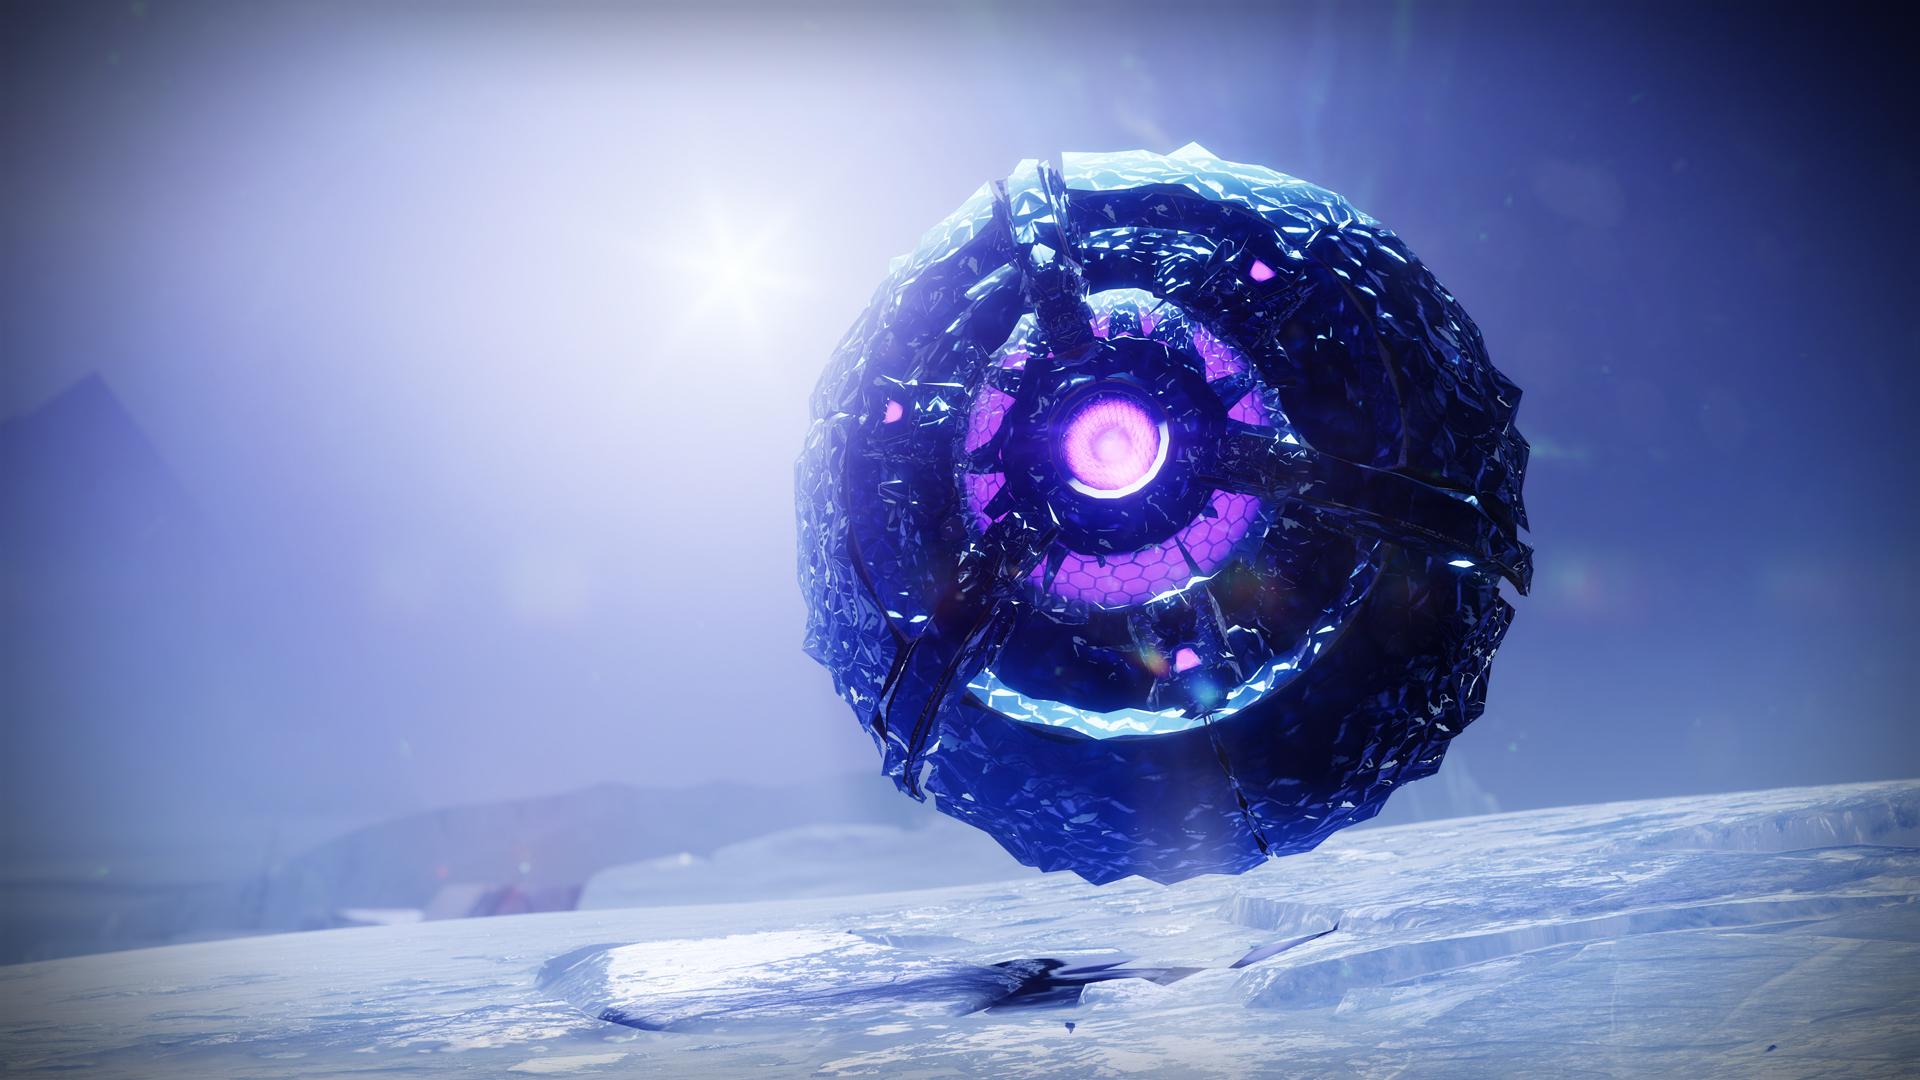 Destiny 2 Beyond Light Key Screen 9